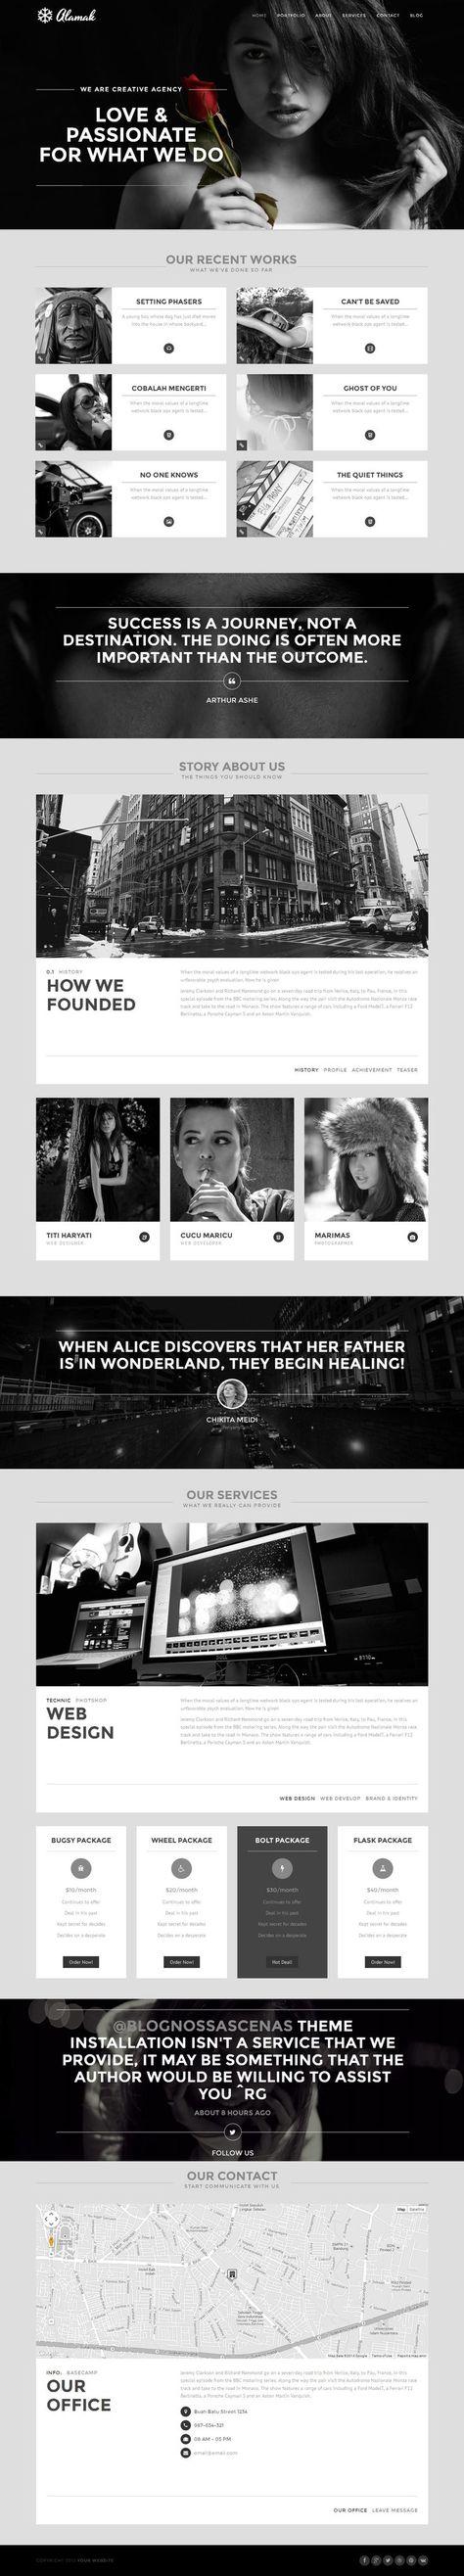 Alamak  Responsive One Page Portfolio Theme #web #design - Wordpress Portfolio Theme - Ideas of Wordpress Portfolio Theme #wordpresstheme #portfoliotheme -   Alamak  Responsive One Page Portfolio Theme #web #design